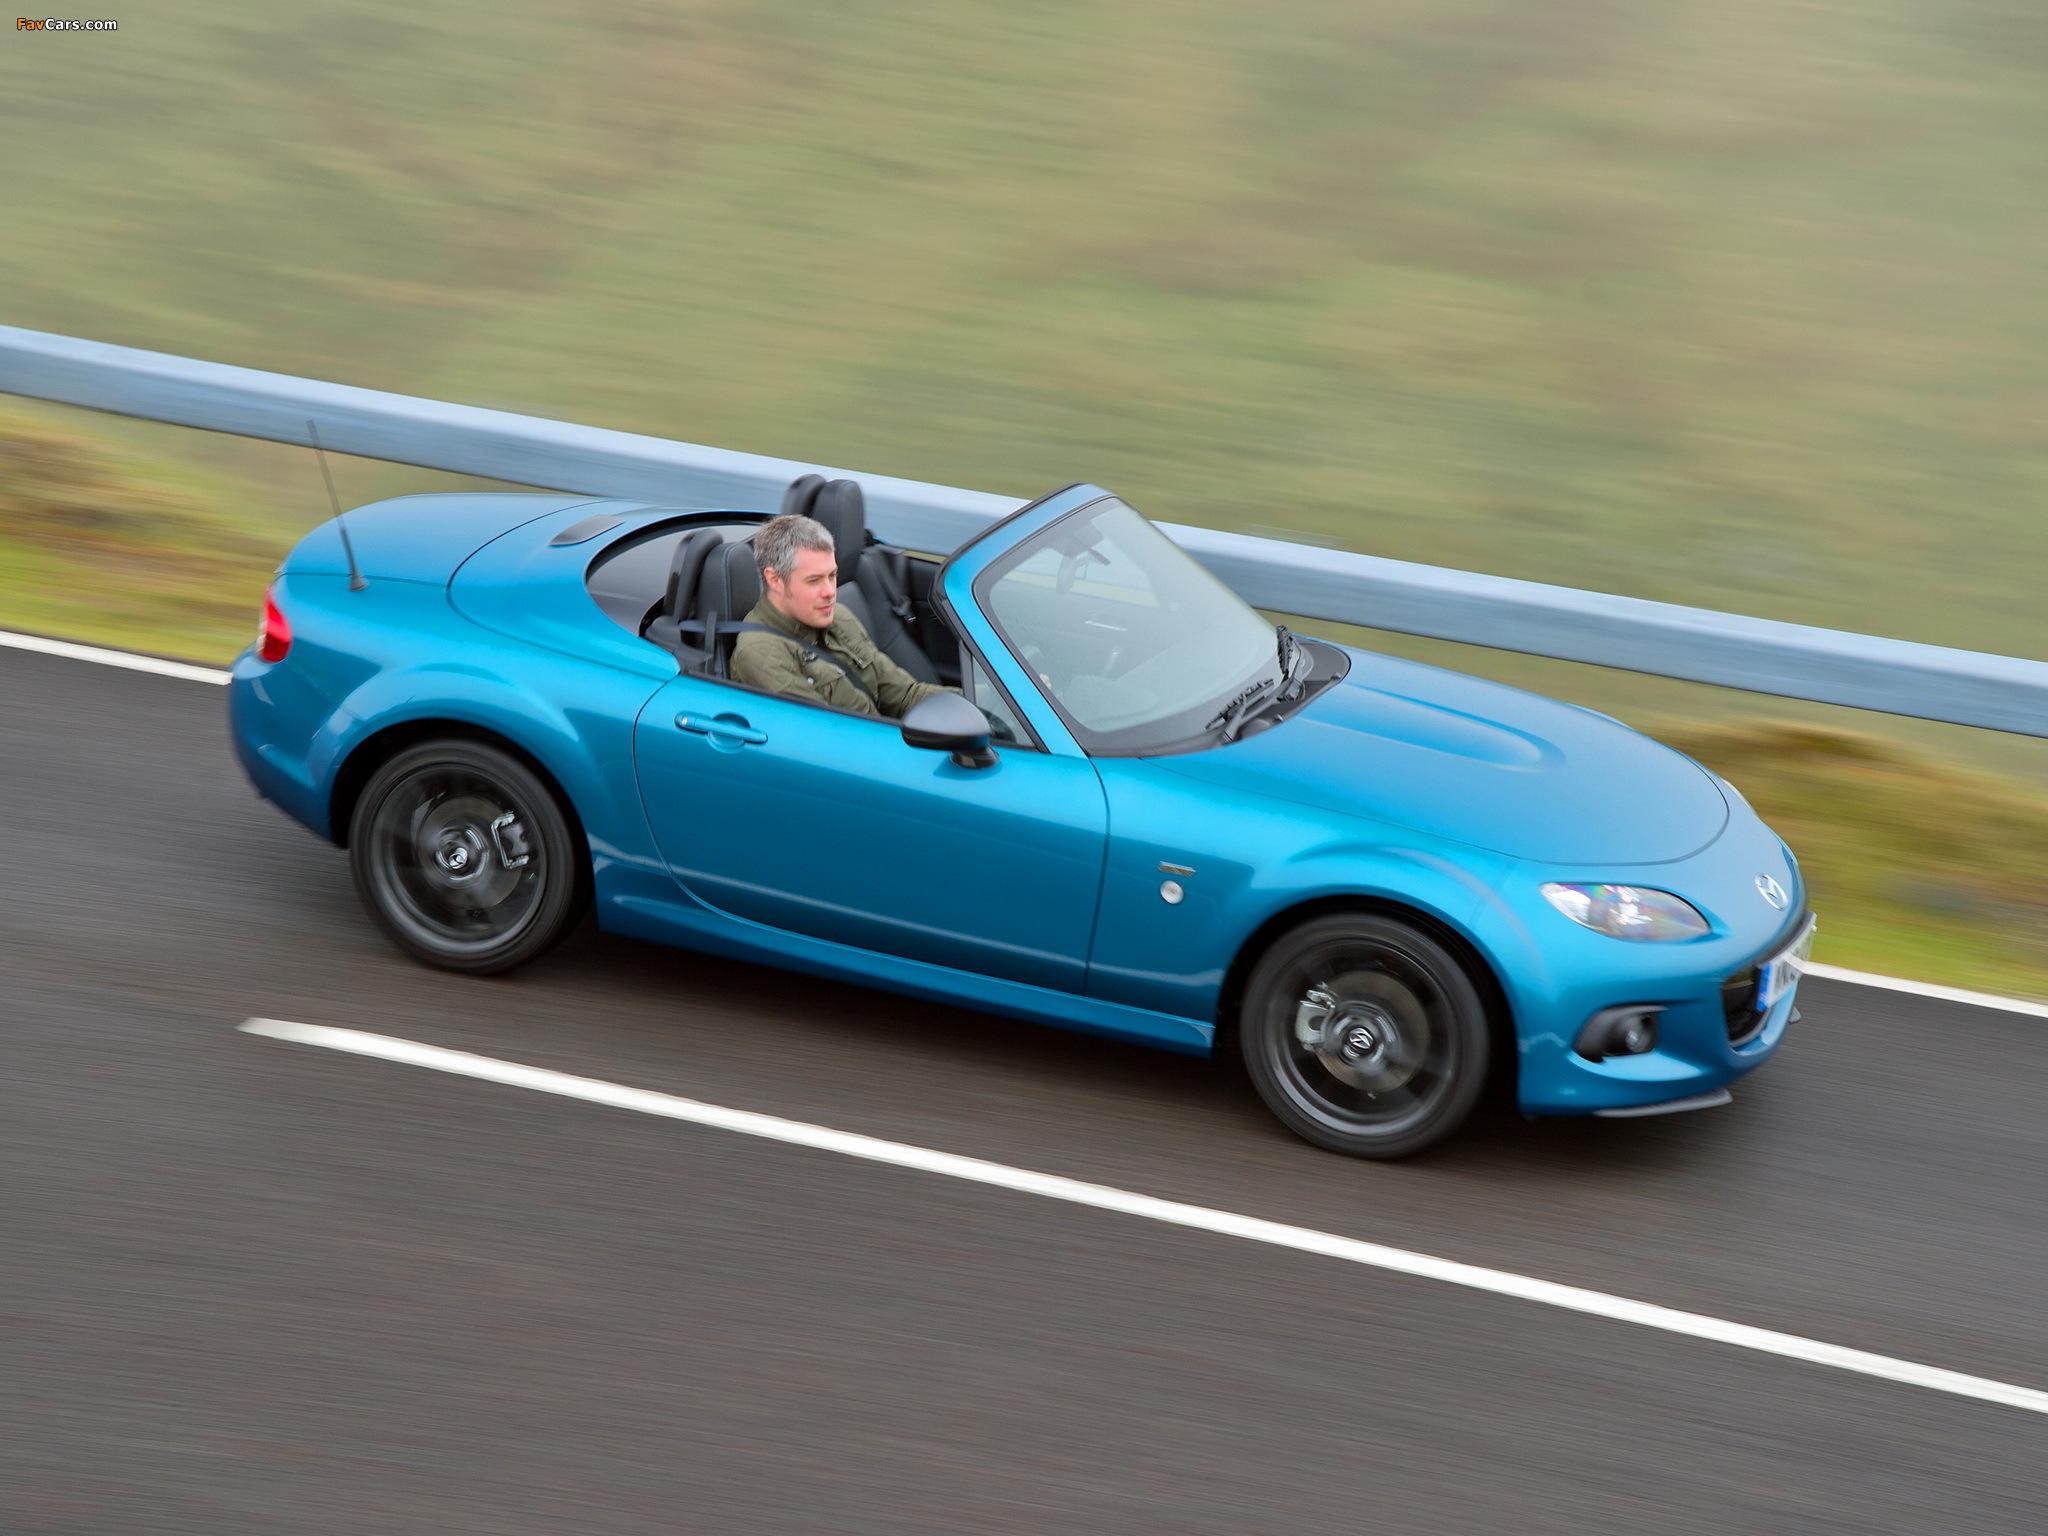 Mazda MX-5 Roadster-Coupe Sport Graphite (NC3) 2013 pictures (2048 x 1536)